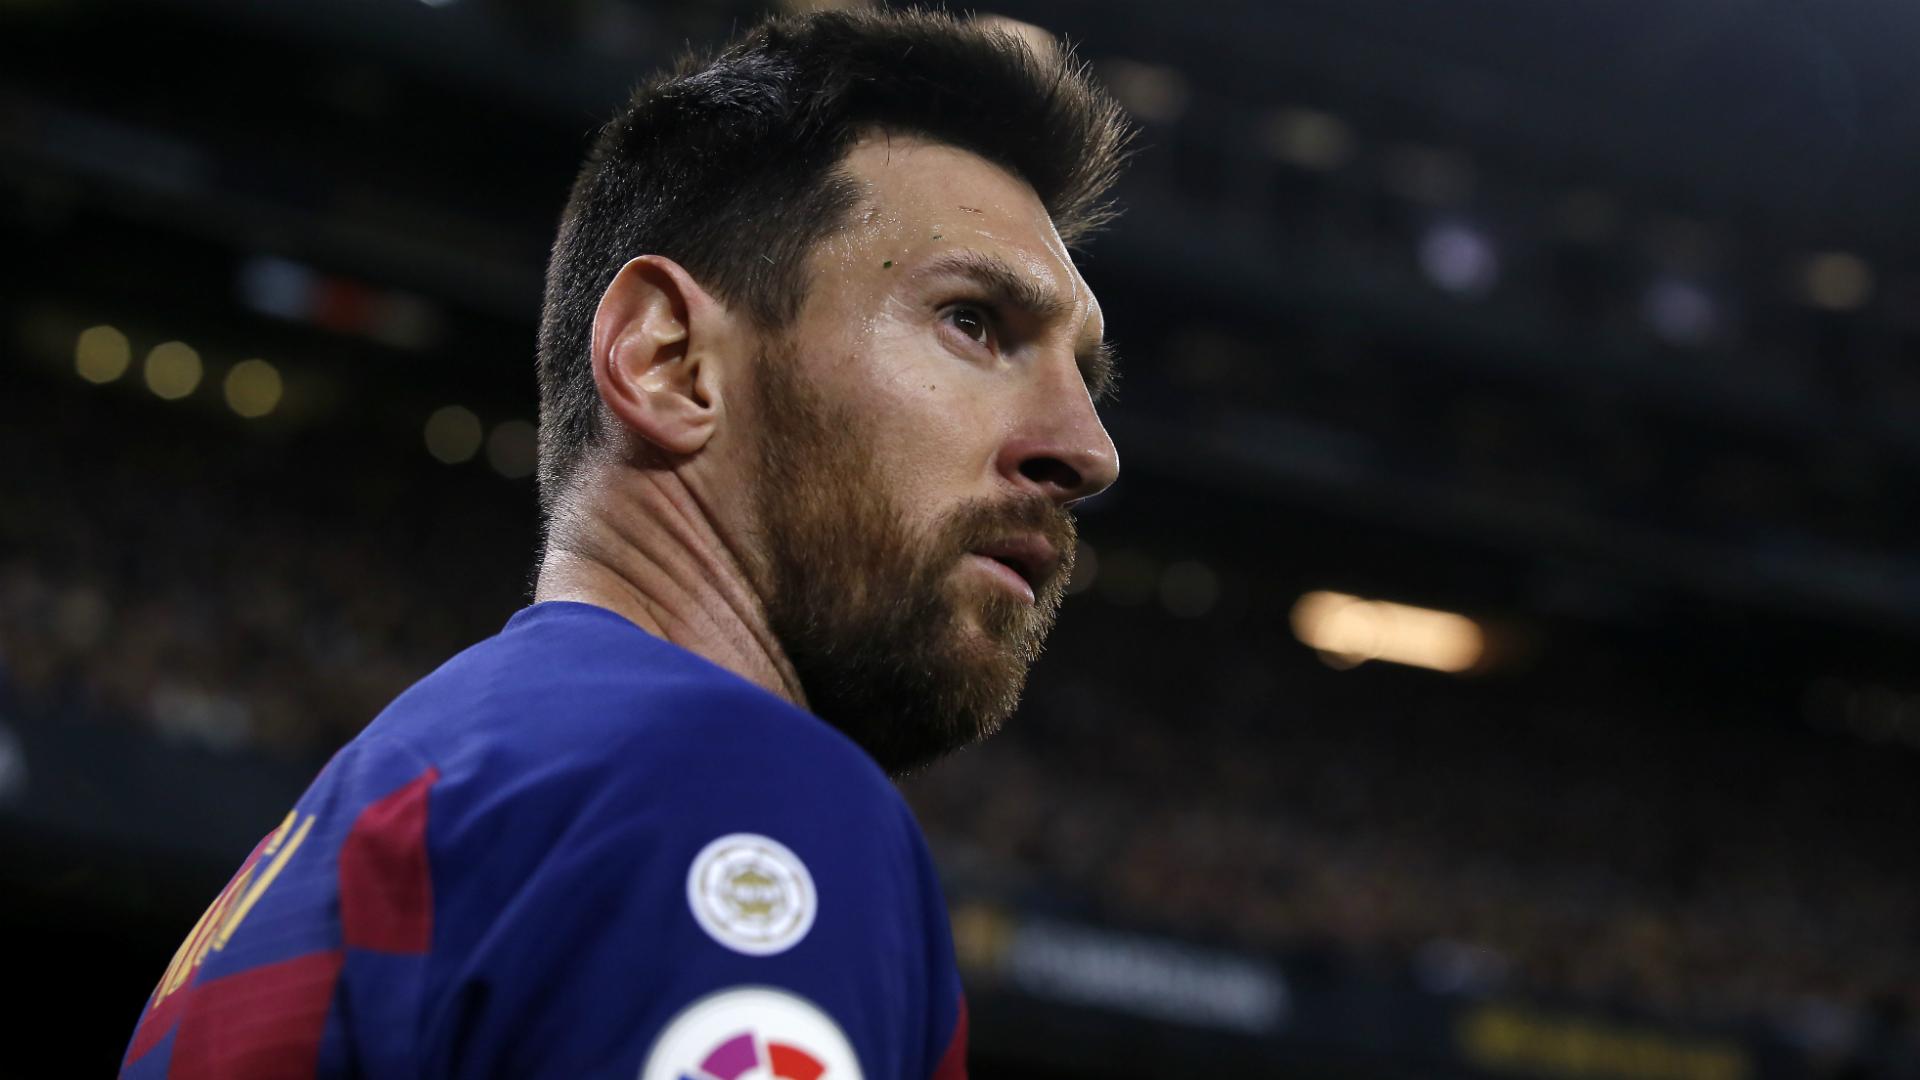 Lionel Messi to Inter not impossible – Moratti